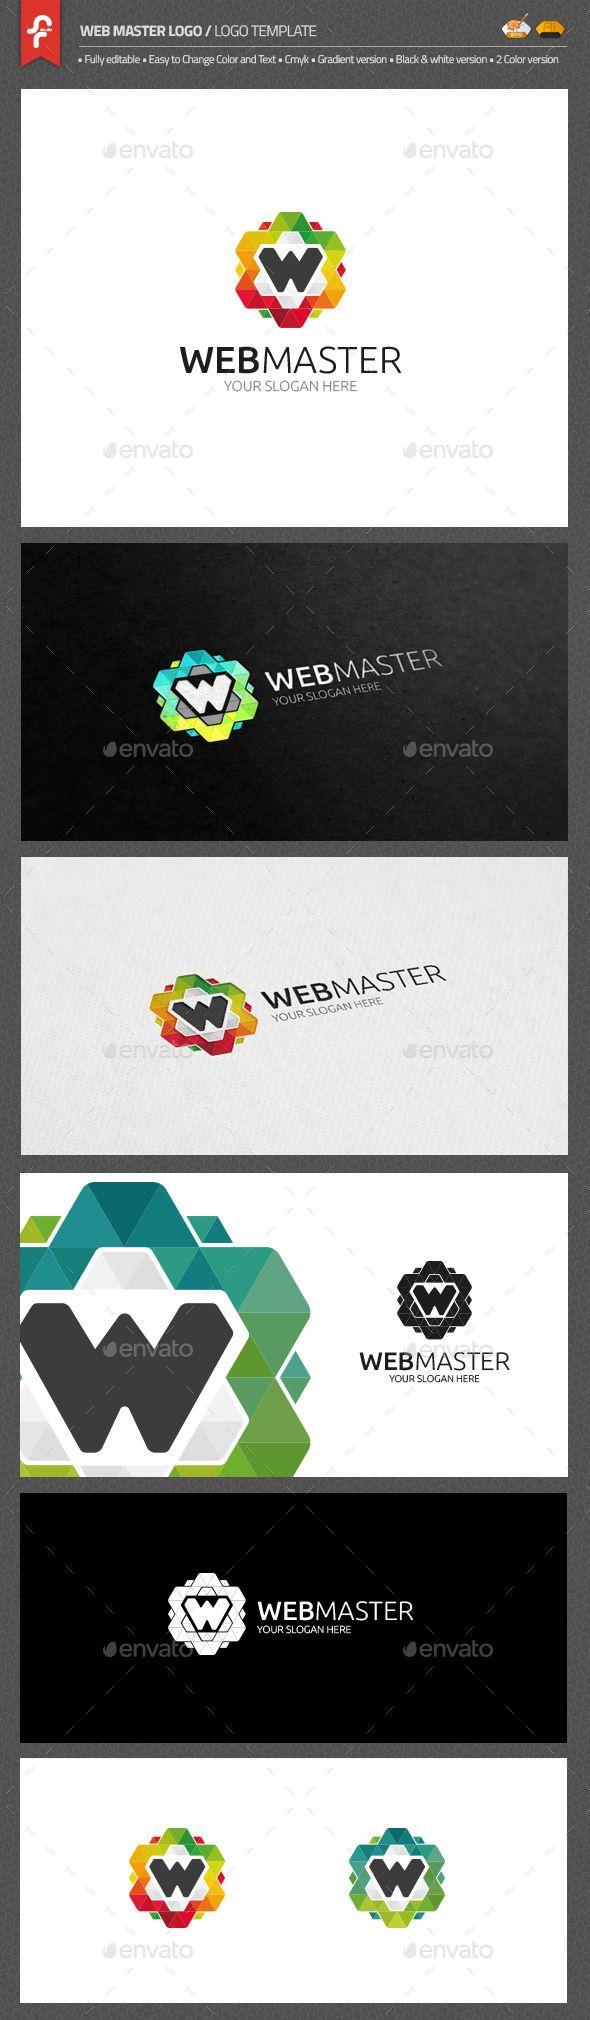 Web Master Logo — AI Illustrator #software #w symbol • Available here → https://graphicriver.net/item/web-master-logo/10607112?ref=pxcr